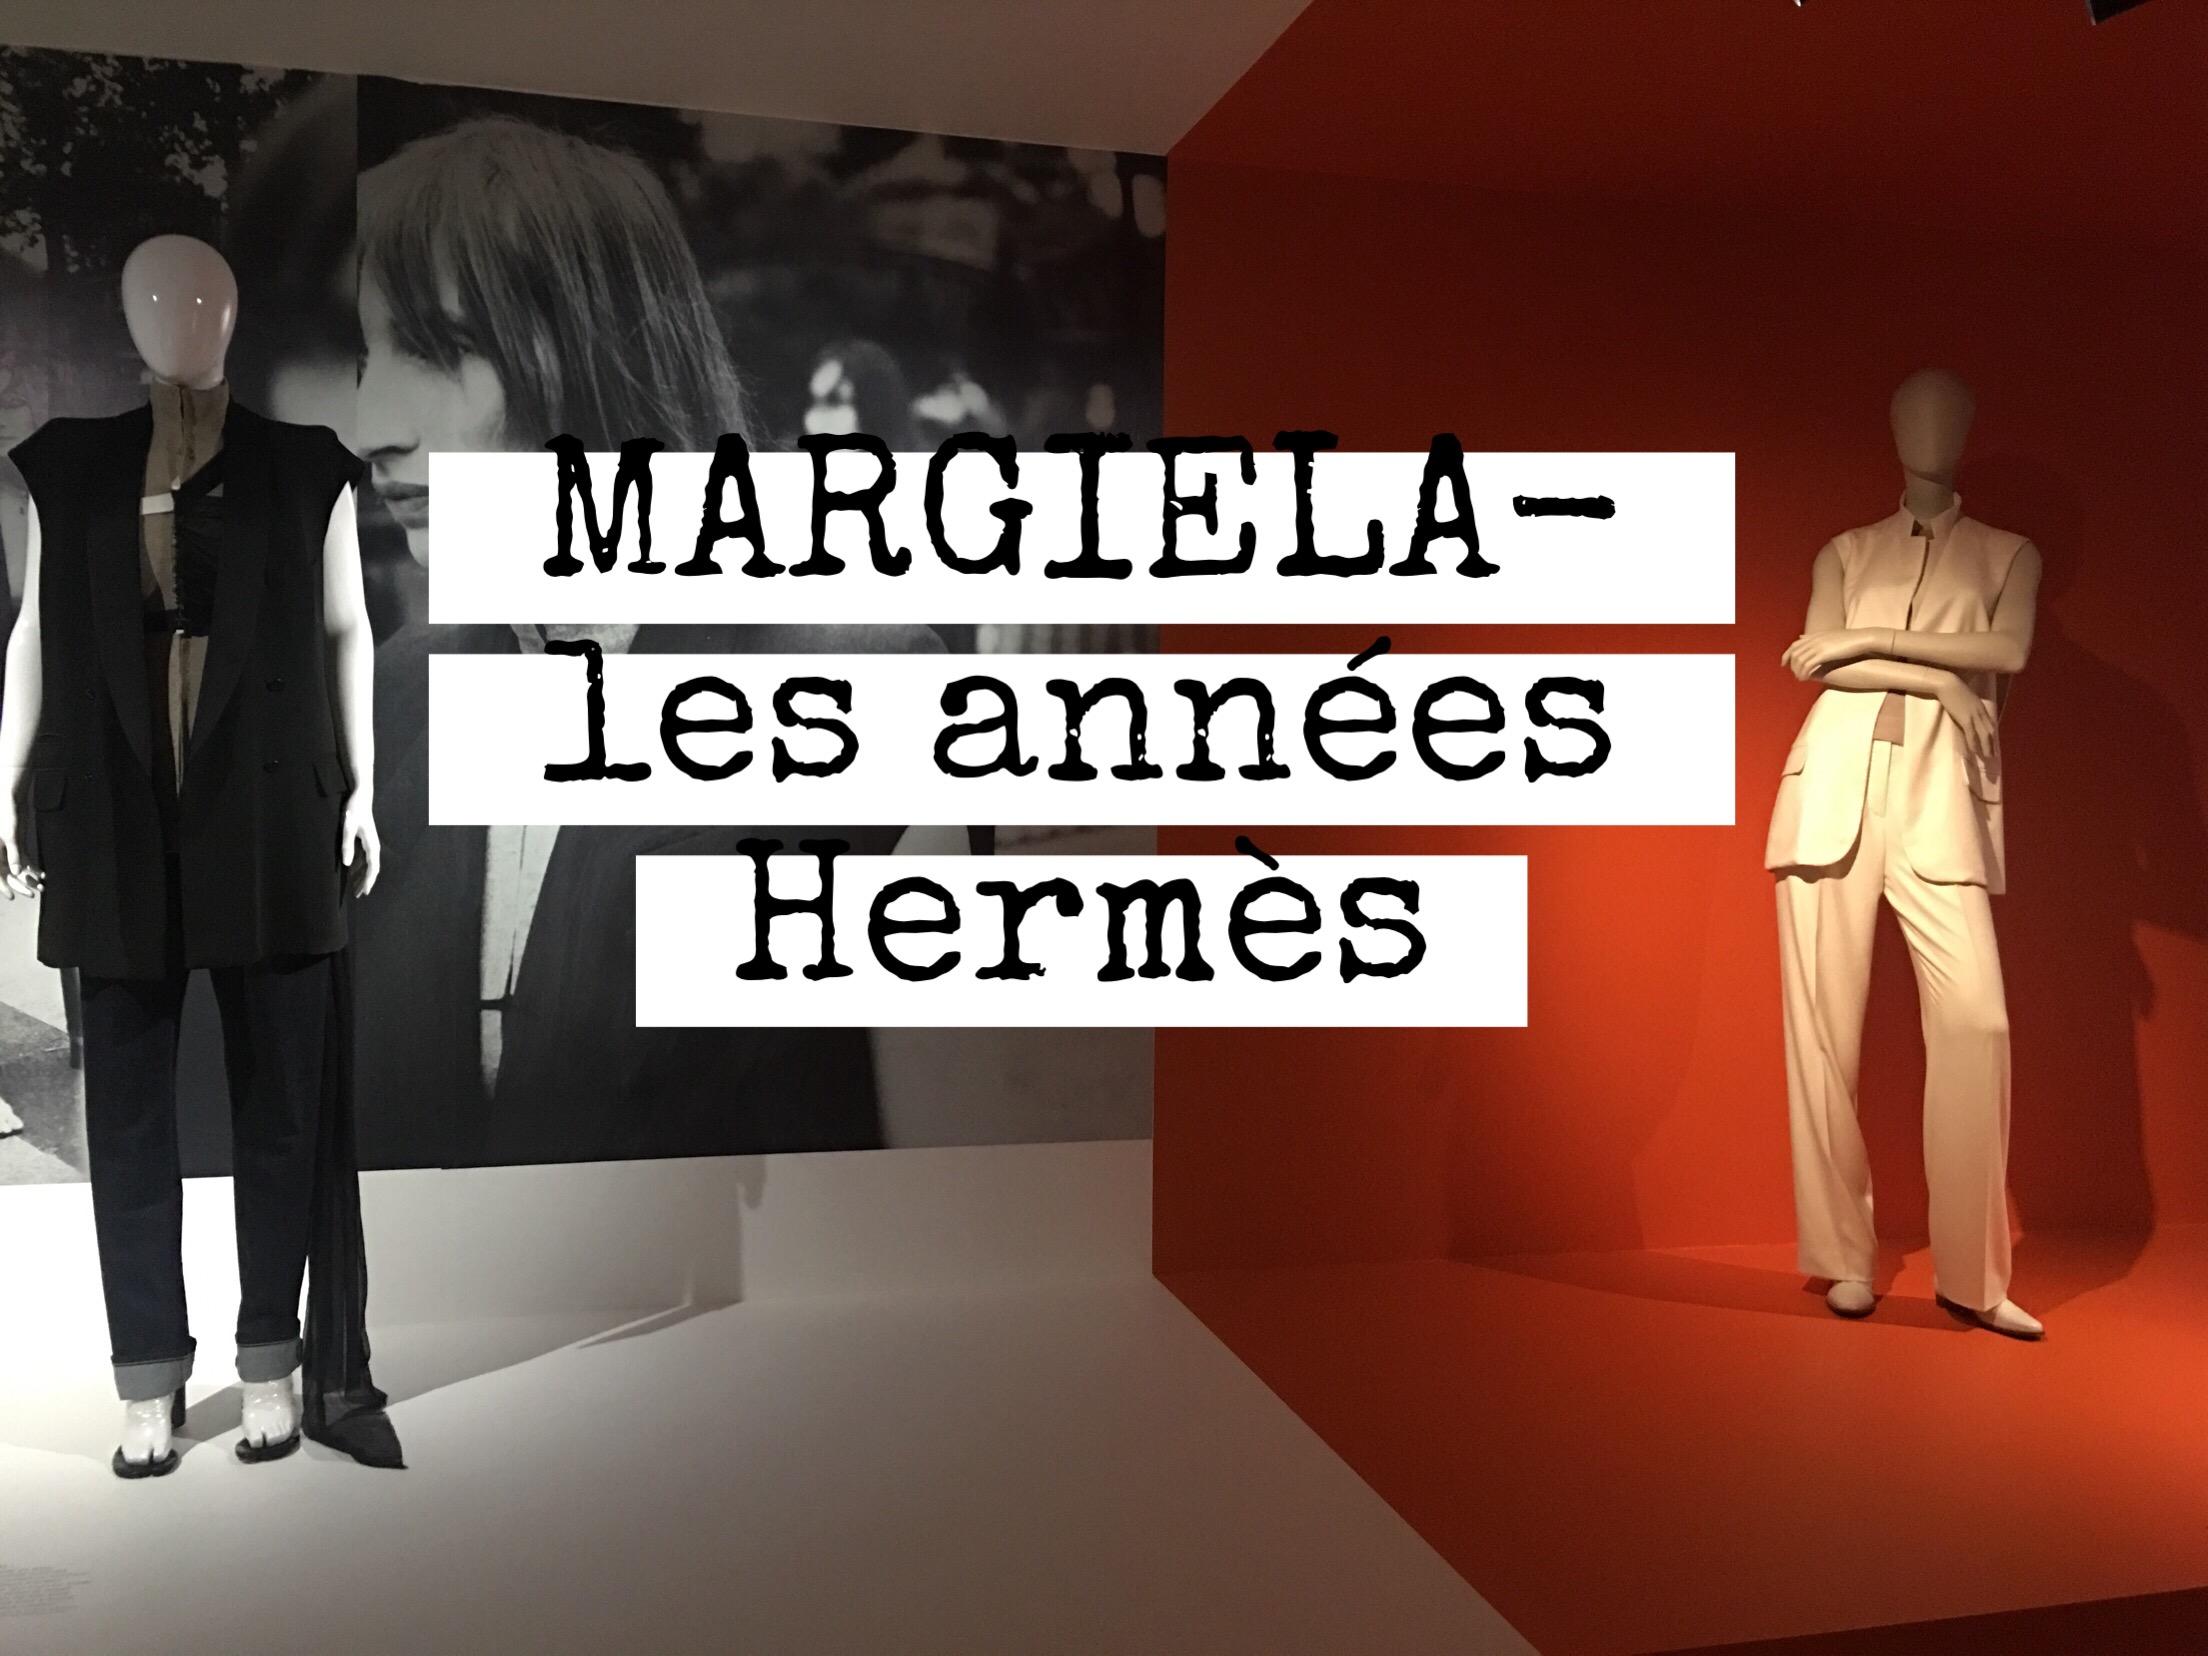 Margiela Hermes